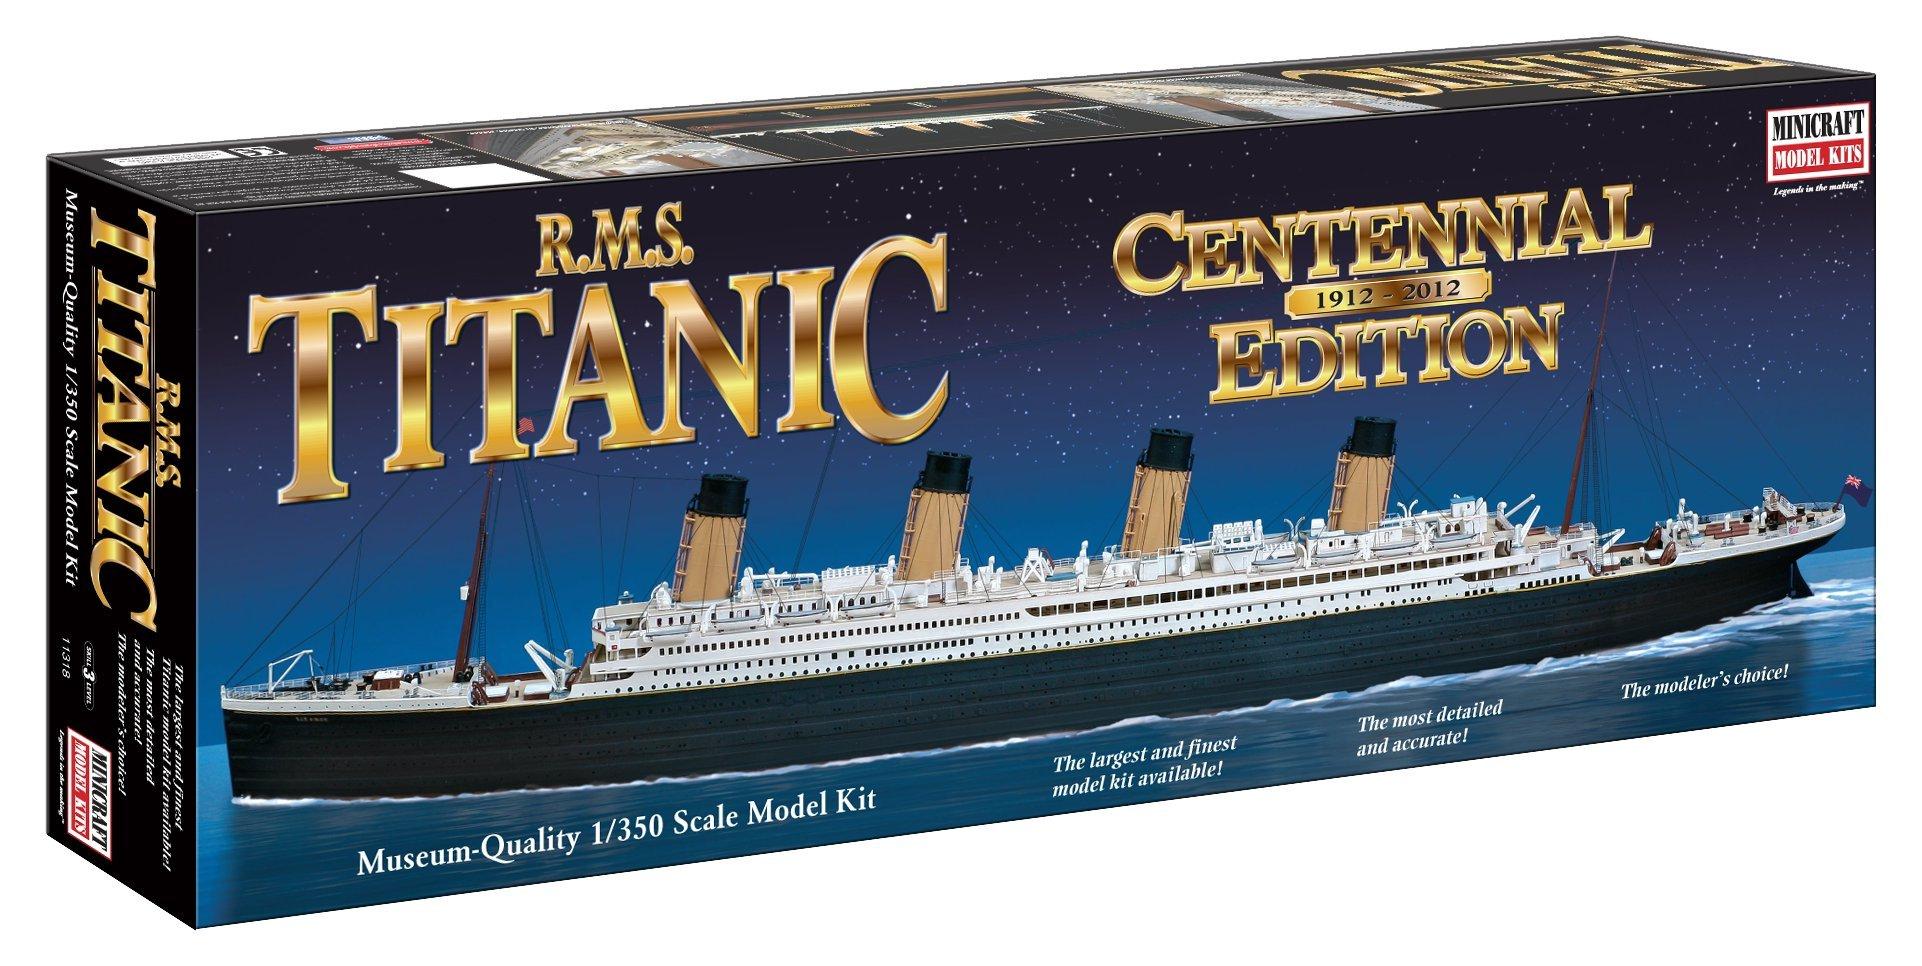 Minicraft RMS Titanic Centennial Edition 1/350 Scale